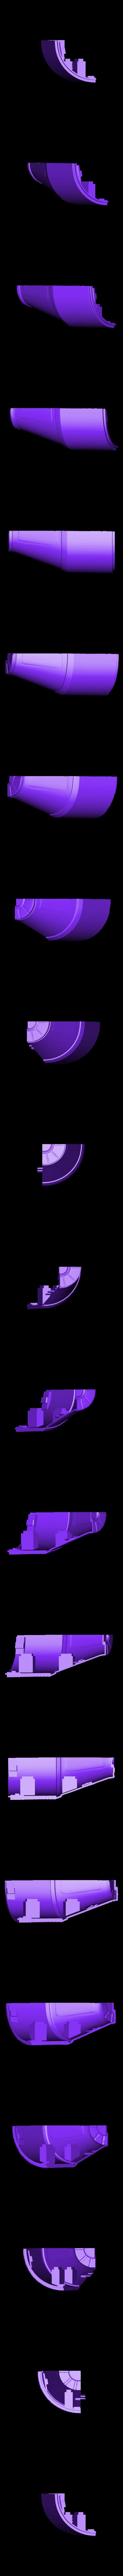 BB_02 (rep).stl Download free STL file Millenium Falcon, Cockpit.  • 3D printable object, Alex_x_x_x